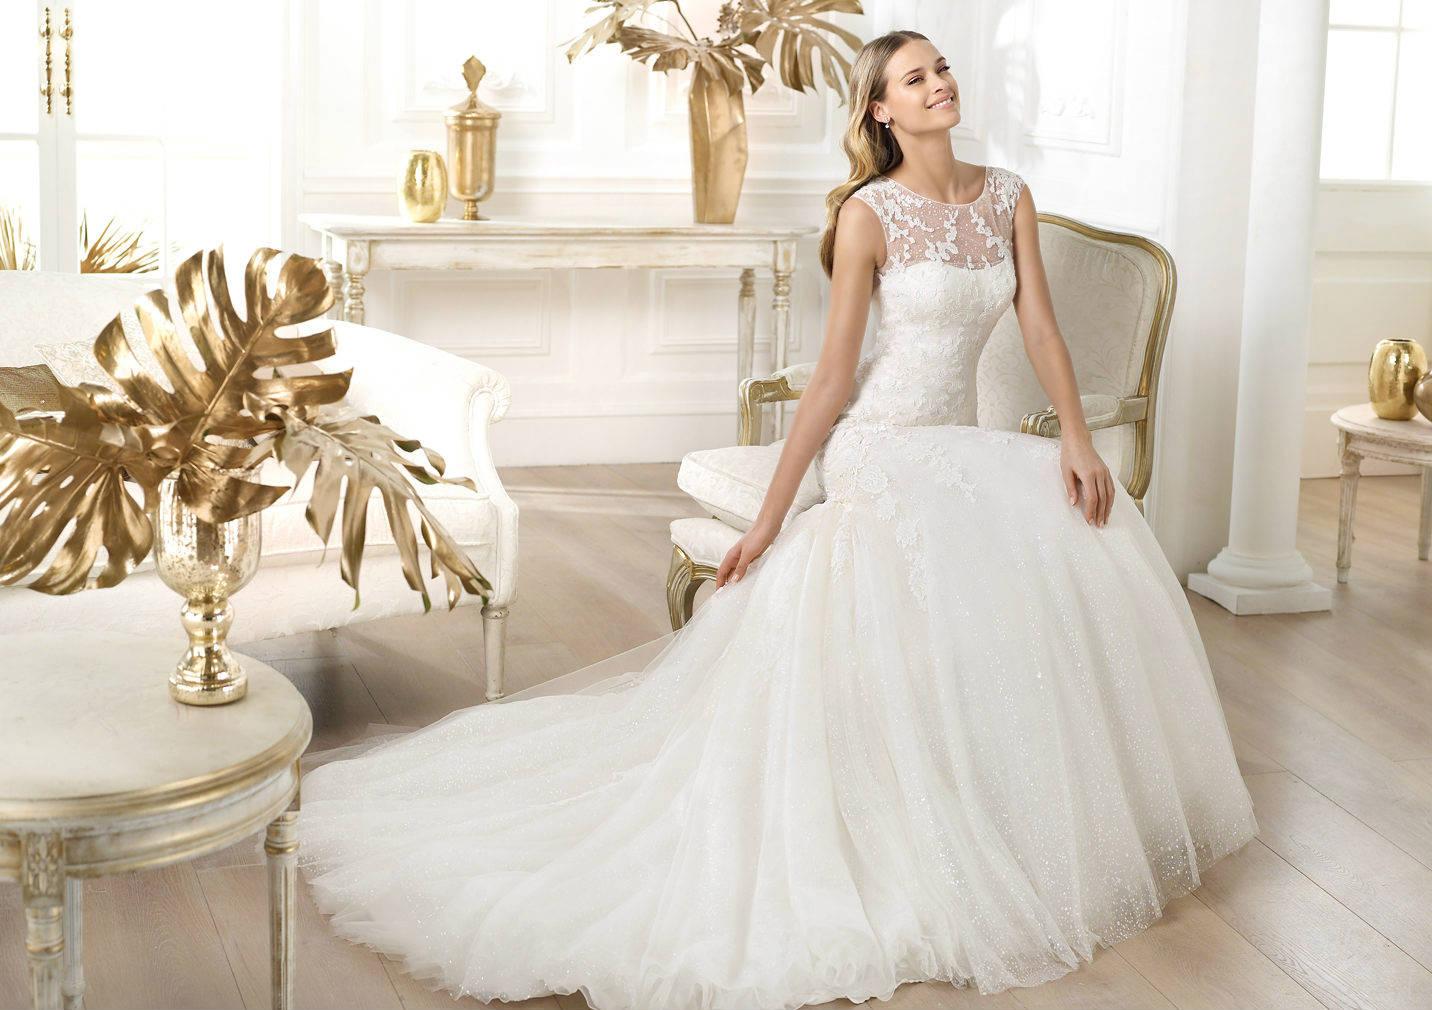 بالصور احدث فساتين الزفاف , موديلات فساتين زفاف جديده لعام 2019 3724 11